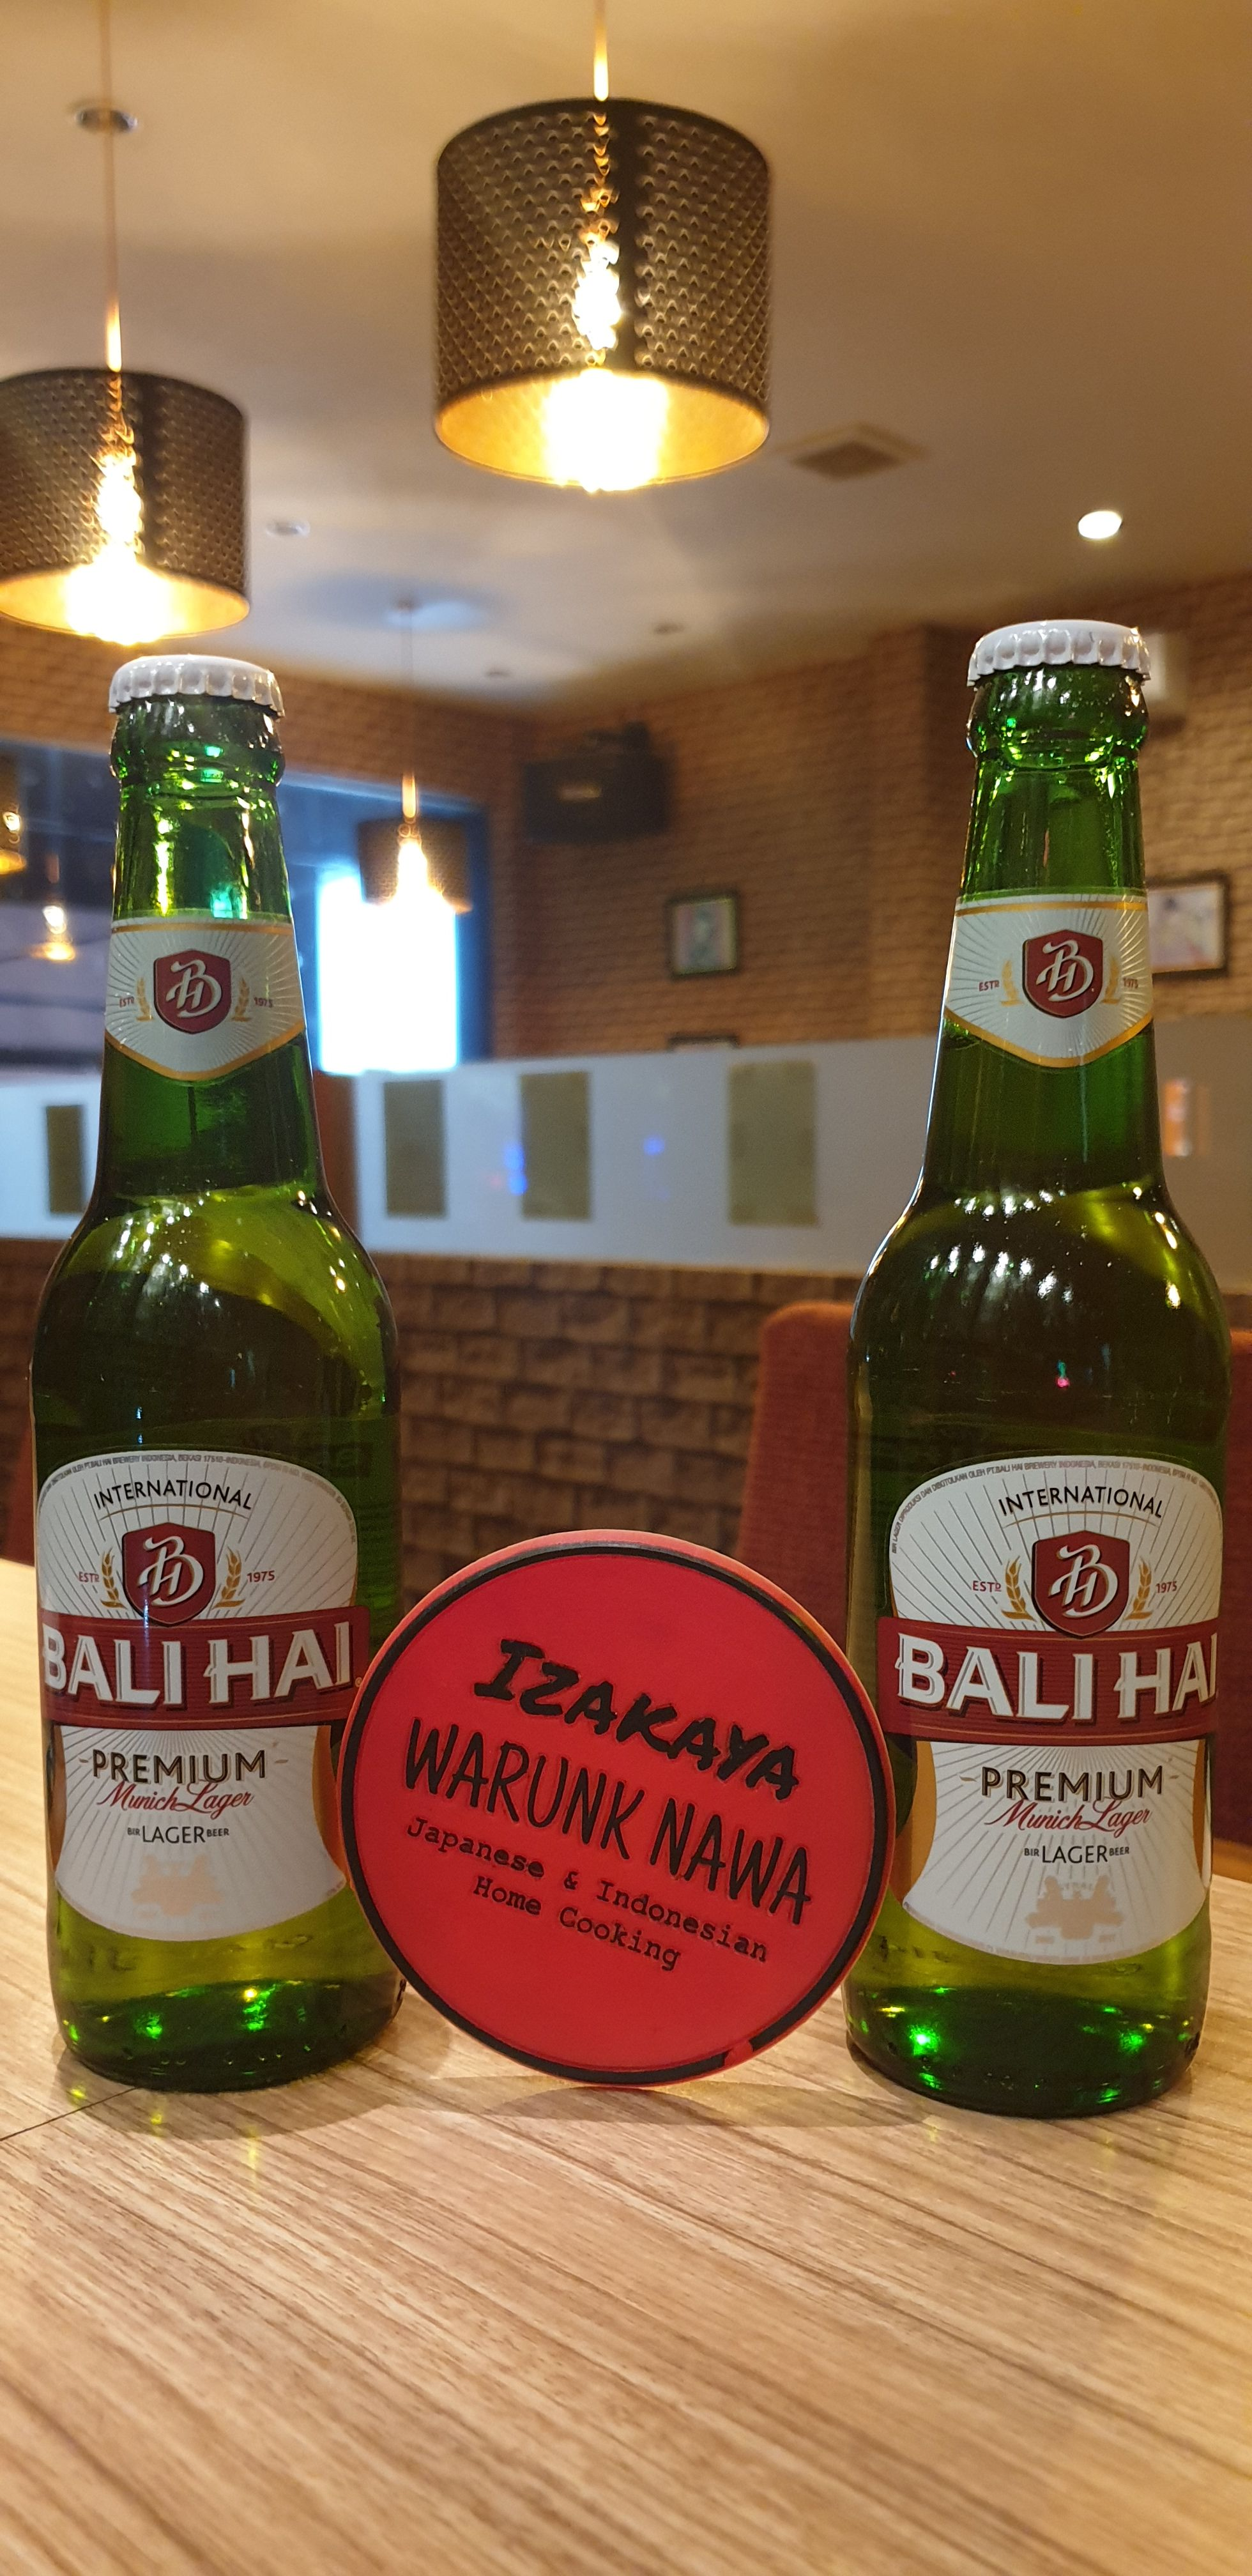 Warunk Nawa Di 2020 Bali Instagram Minuman